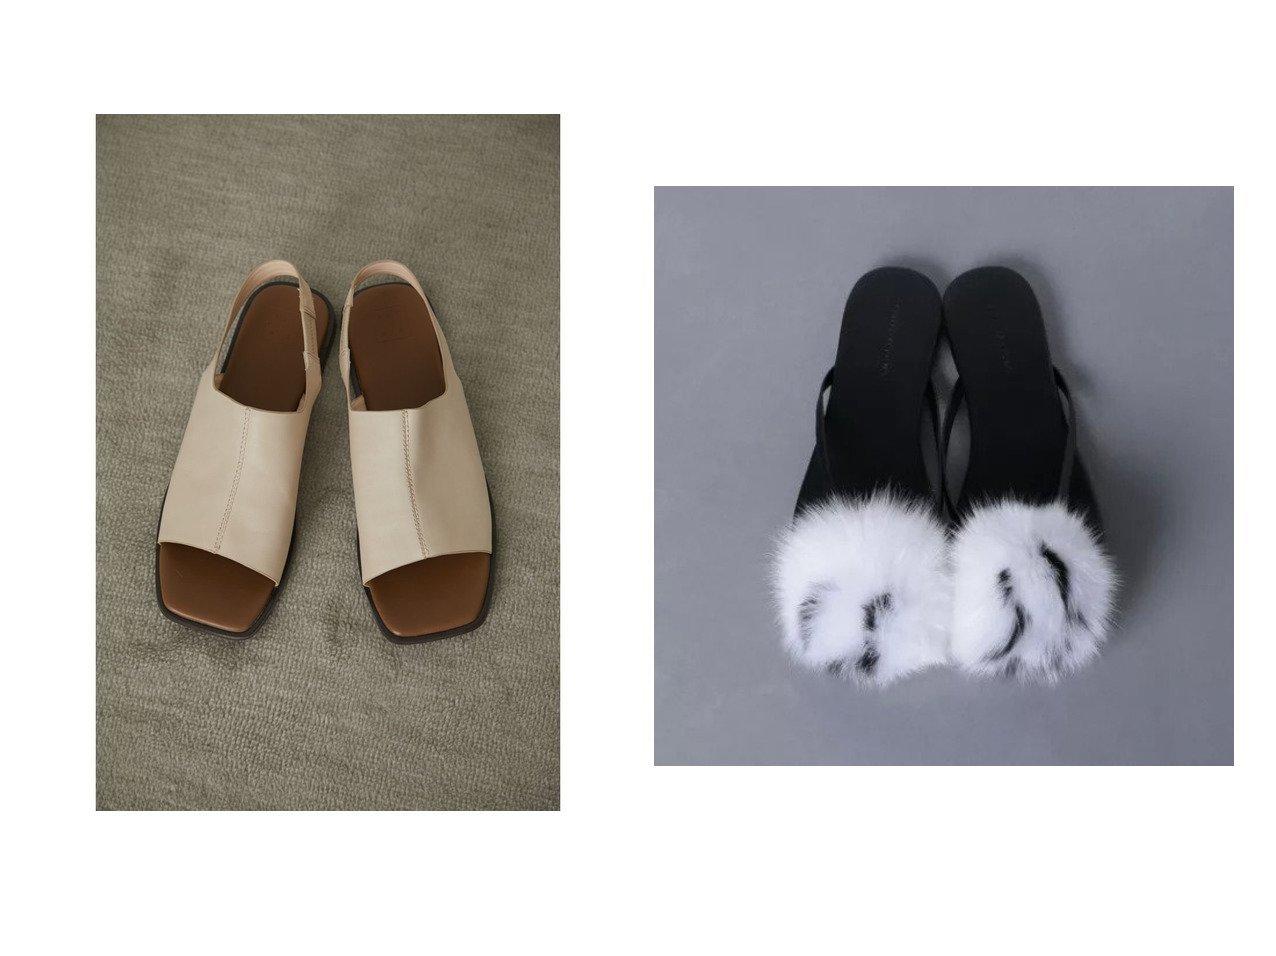 【RIM.ARK/リムアーク】のSquare toe covered sandal&【UNITED ARROWS/ユナイテッドアローズ】のUWFM ファー トング サンダル 【シューズ・靴】おすすめ!人気、トレンド・レディースファッションの通販 おすすめで人気の流行・トレンド、ファッションの通販商品 インテリア・家具・メンズファッション・キッズファッション・レディースファッション・服の通販 founy(ファニー) https://founy.com/ ファッション Fashion レディースファッション WOMEN アクセサリー エレガント サンダル シューズ 夏 Summer |ID:crp329100000049414